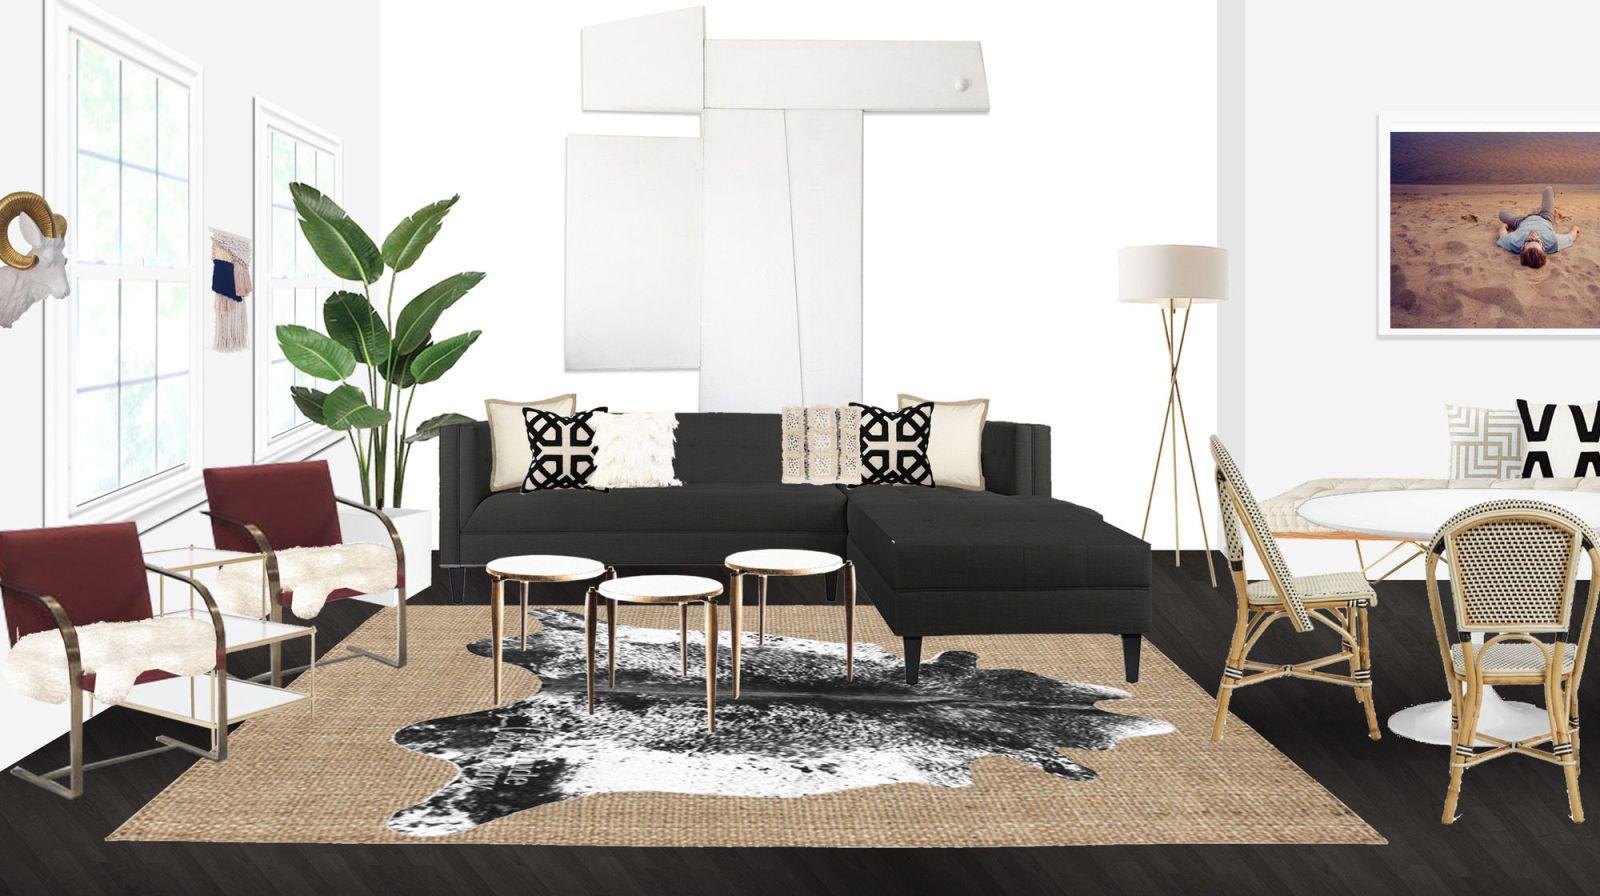 Pavlock Interior Design Advice